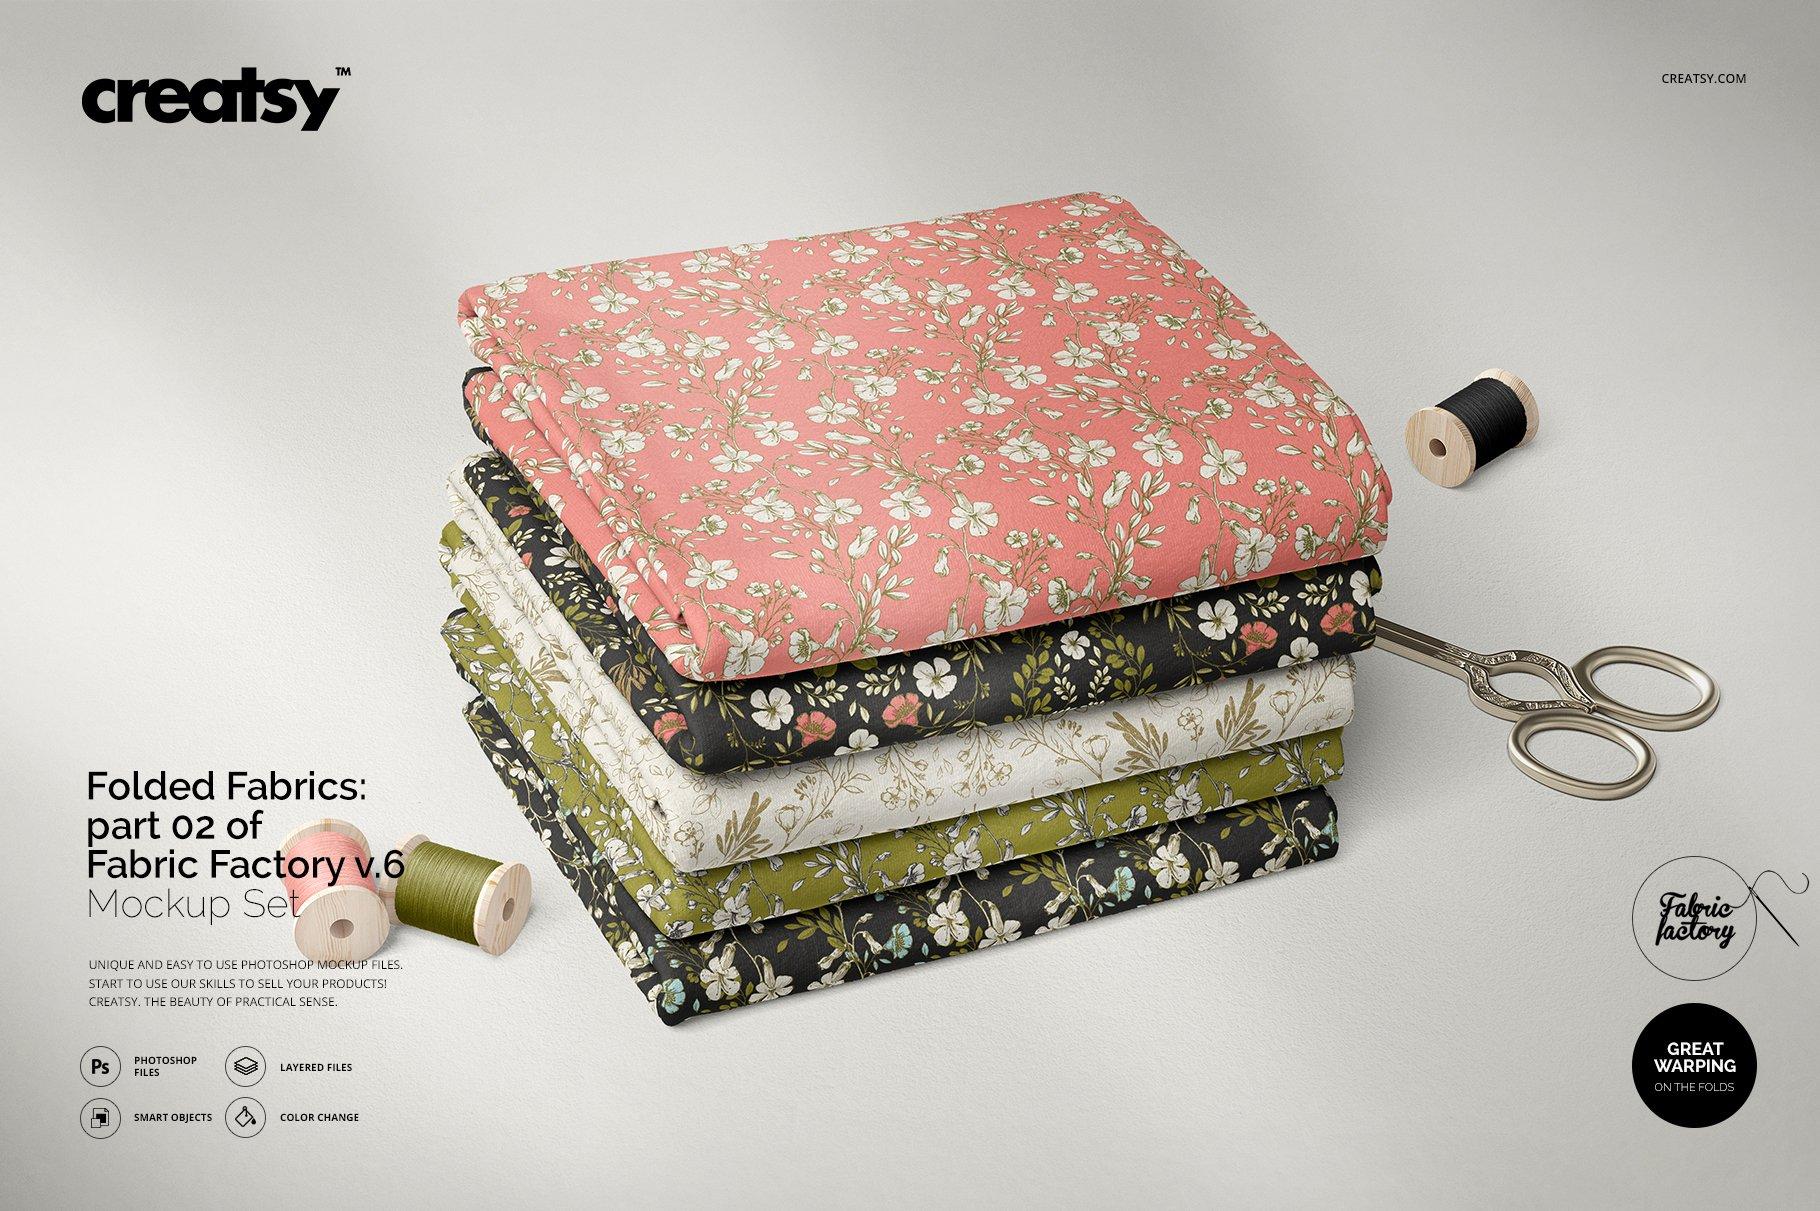 折叠纺织面料布料印花设计展示样机 Folded Fabrics Mockup 02/FF v.6插图